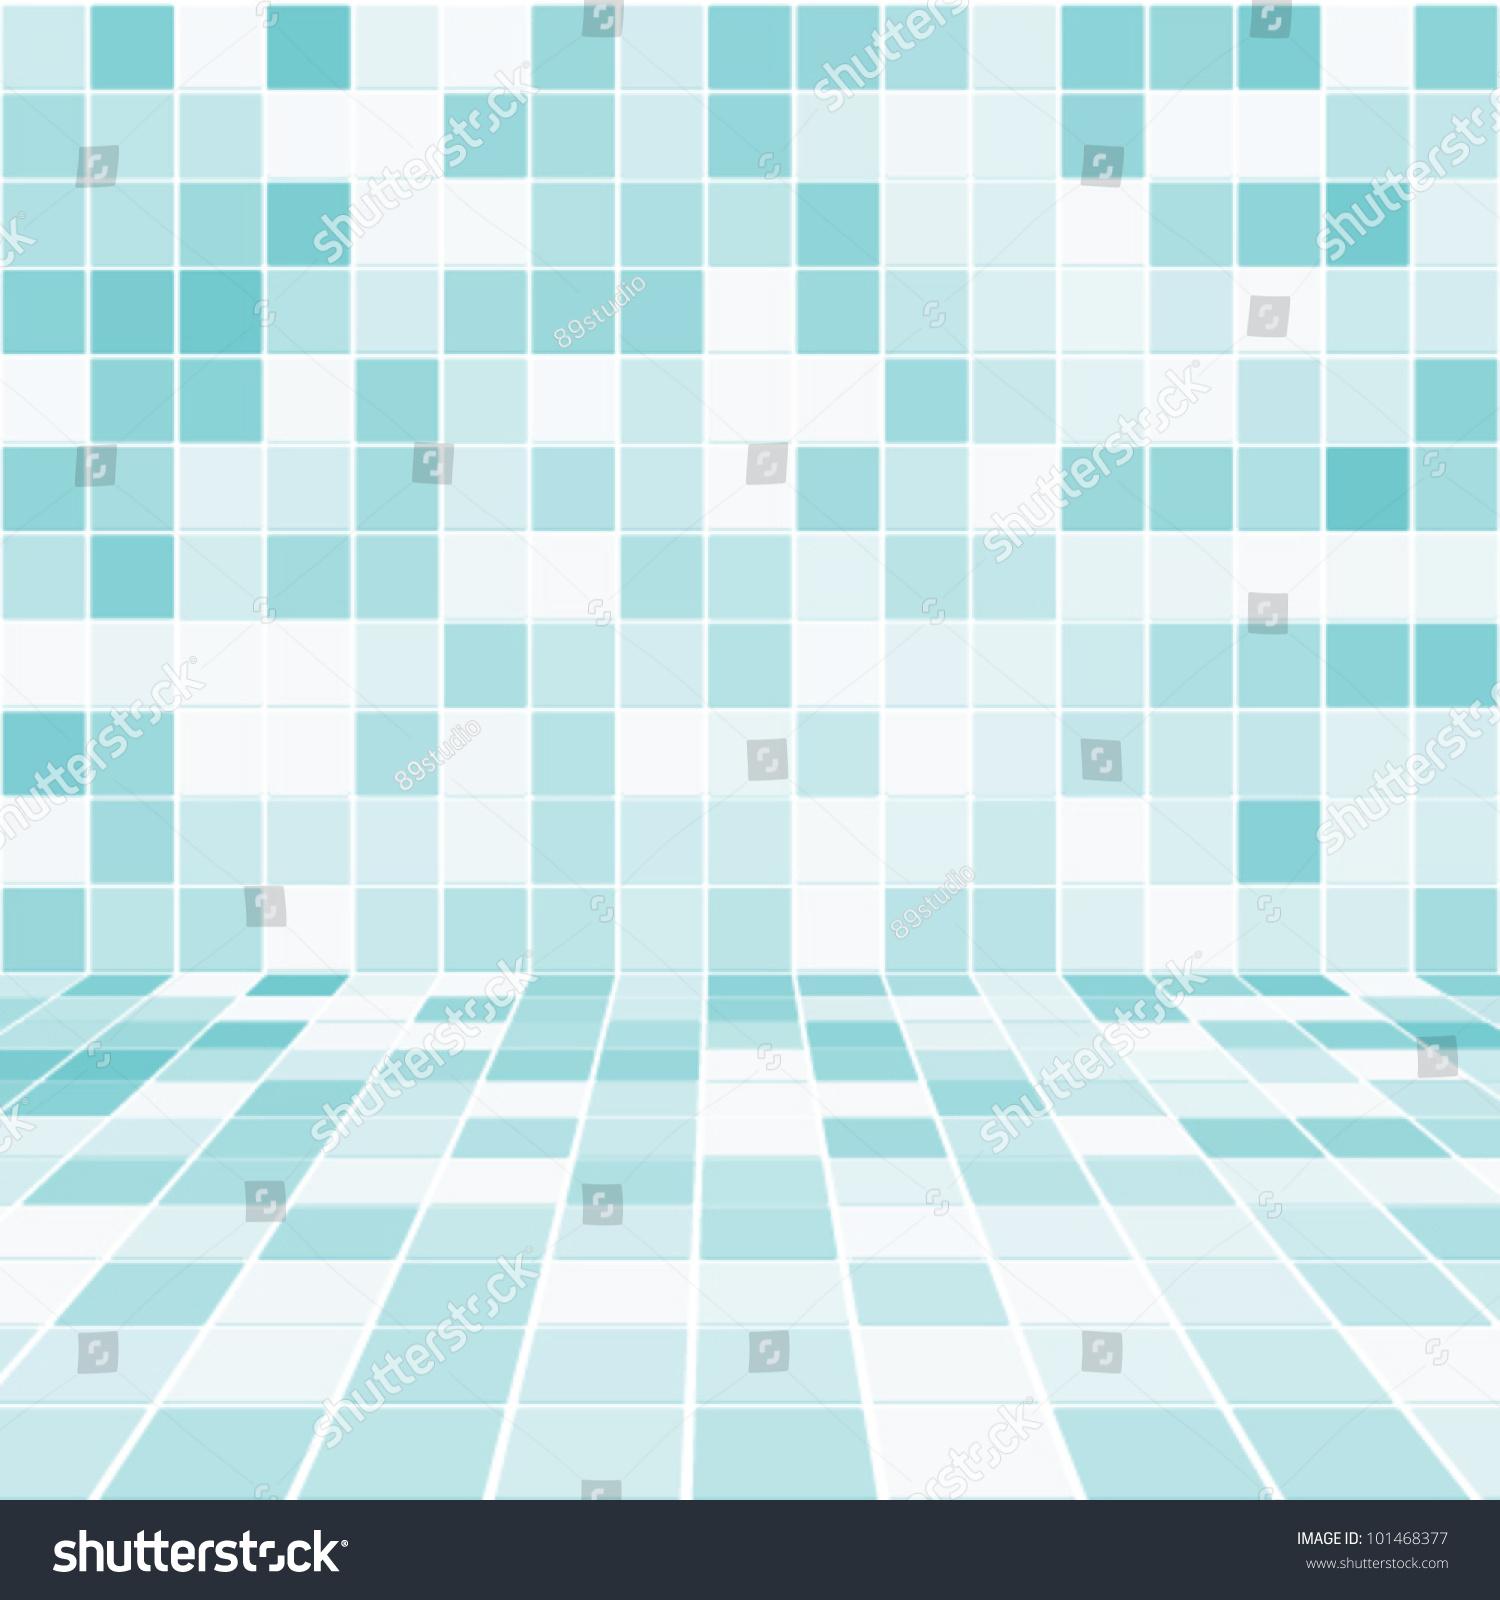 Interior Room Mosaic Tiled Wall Vector Stock Vector (Royalty Free ...